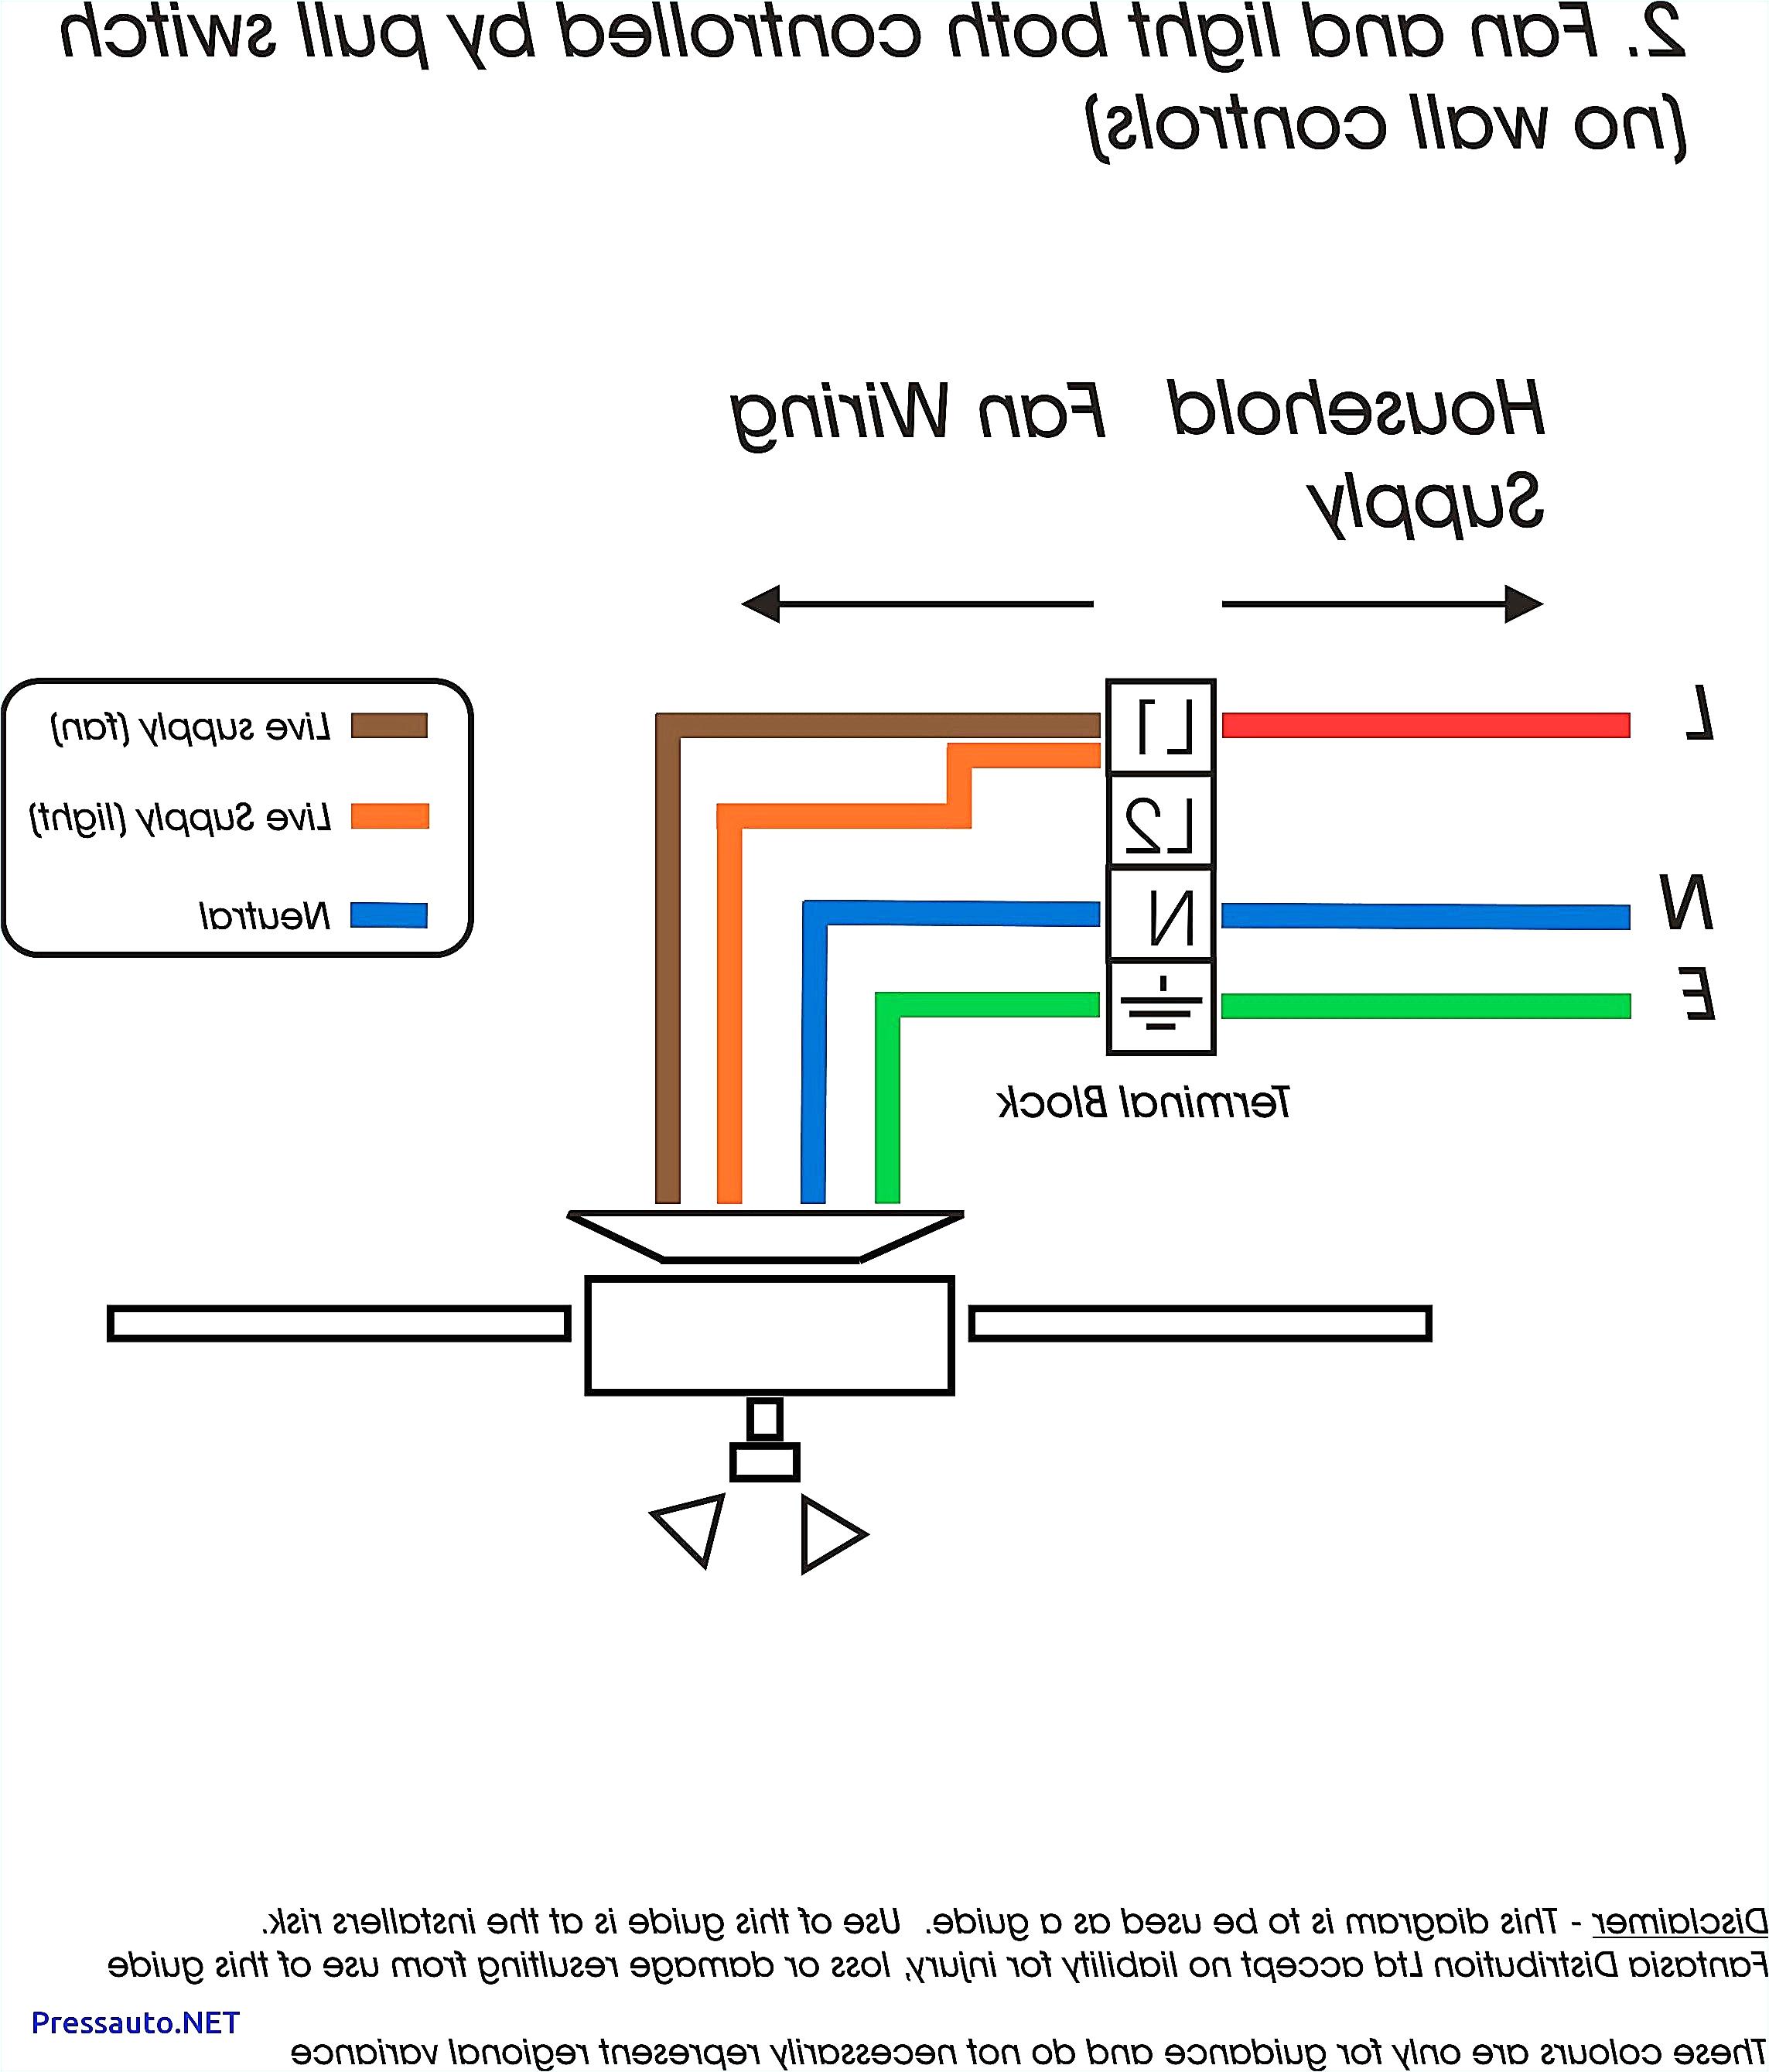 cat radio wiring harness wiring diagram used cat radio wiring harness cat radio wiring